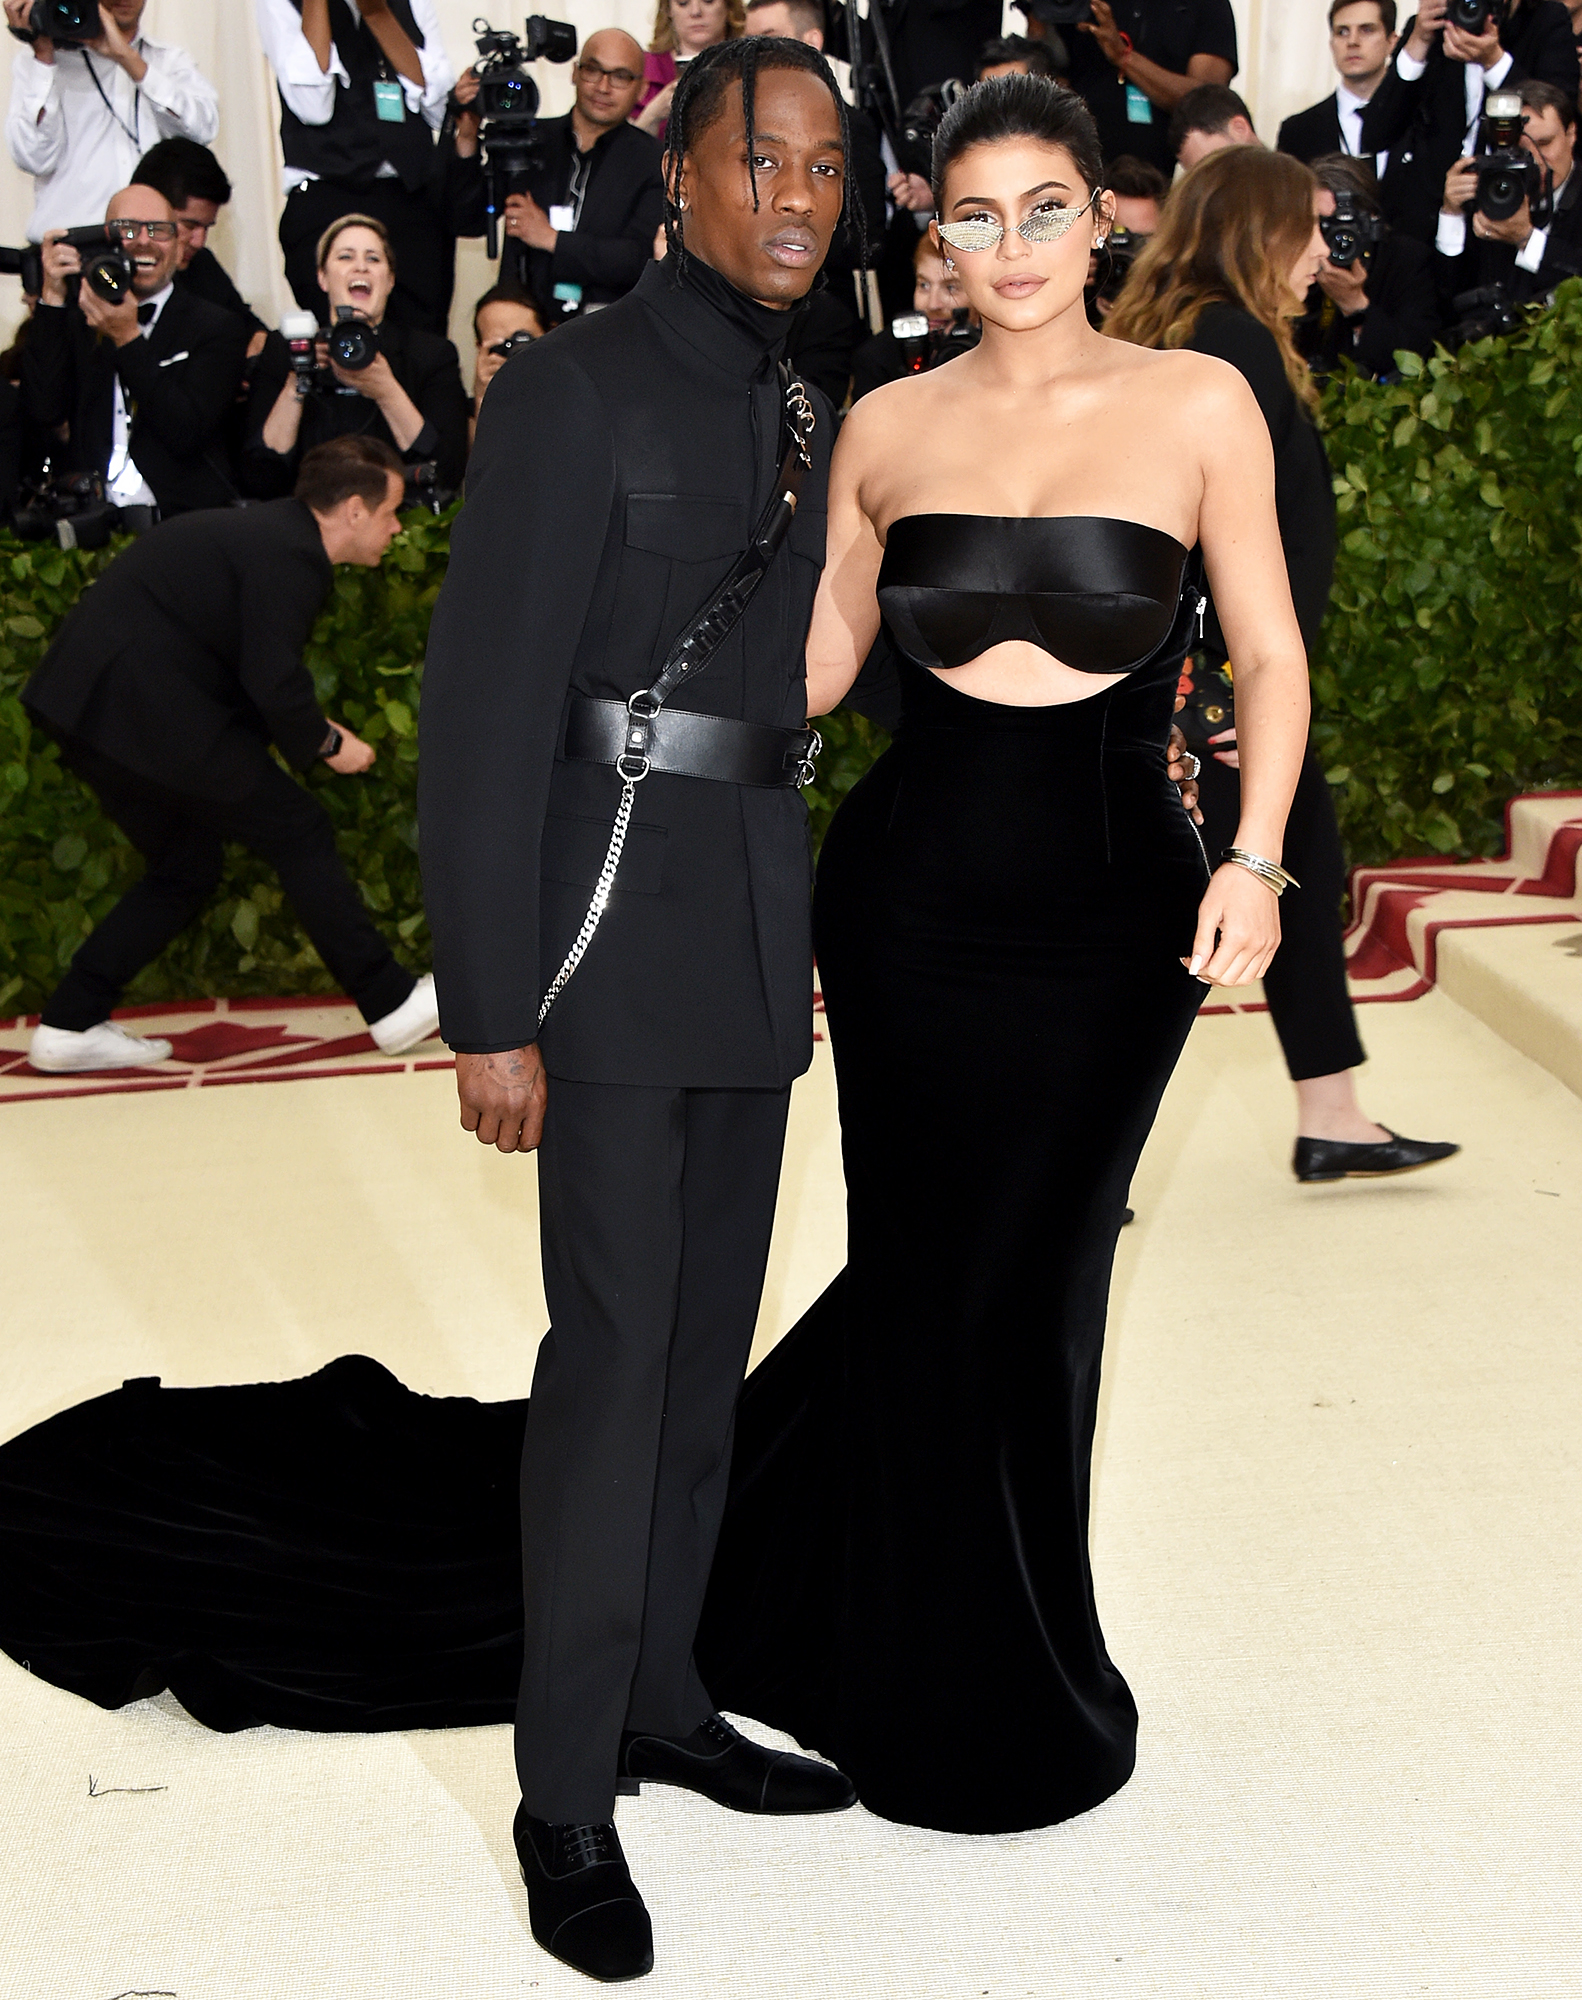 Travis Scott Kylie Jenner Met Gala 2018